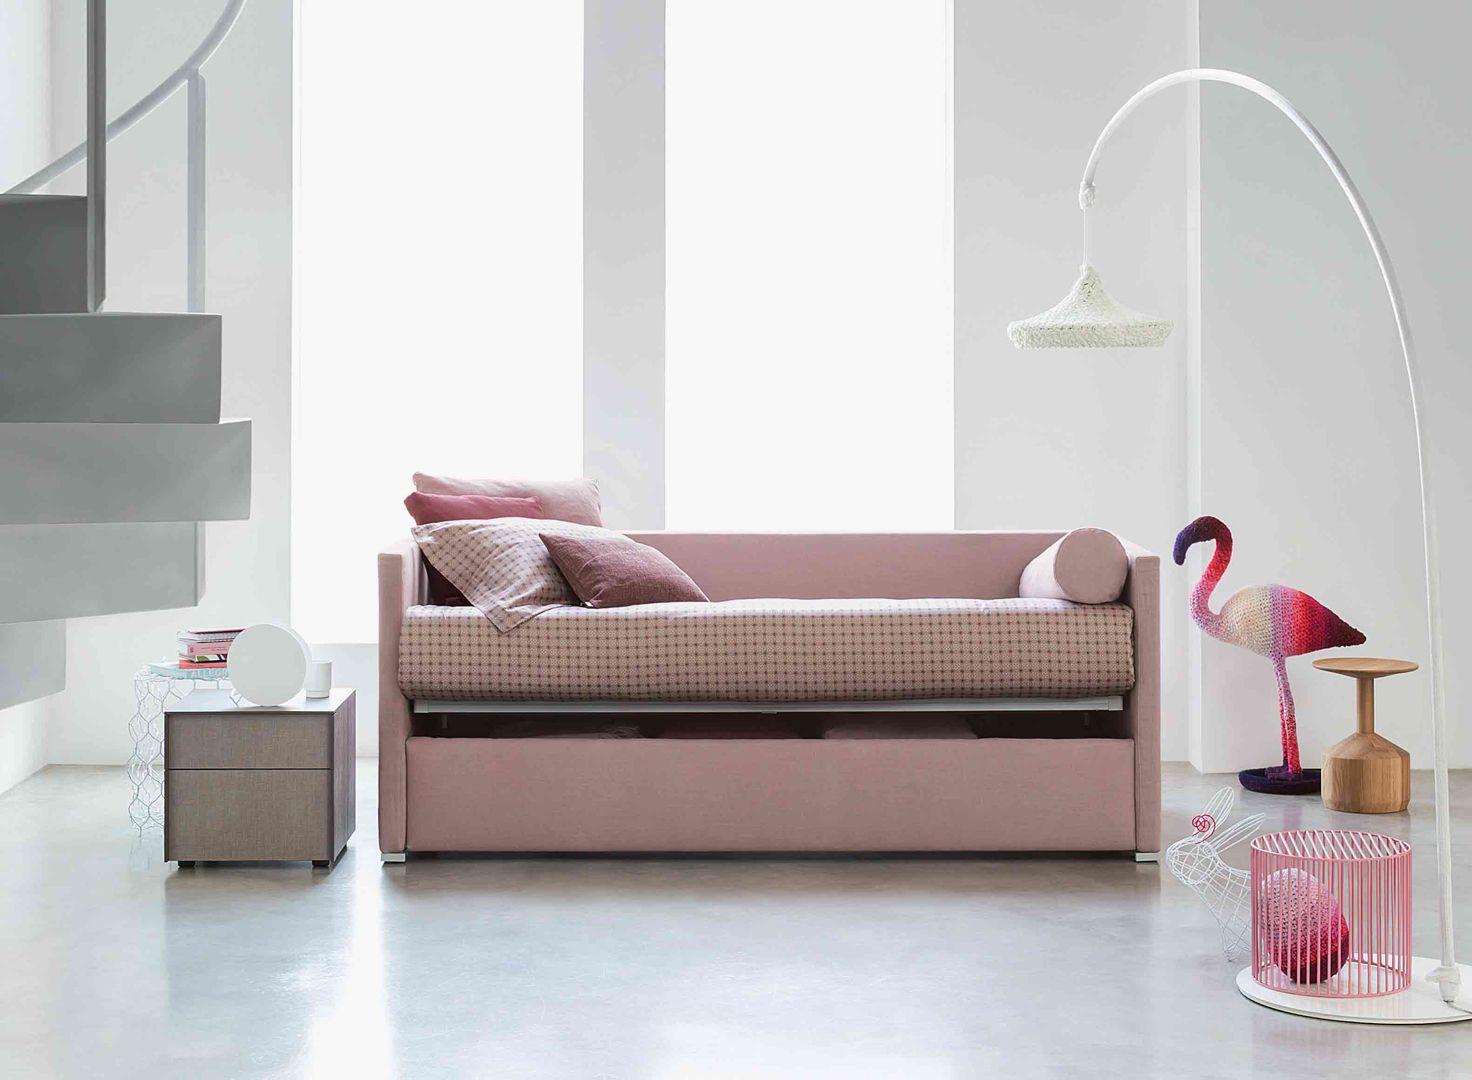 arredo design barzaghi: flou arredo design barzaghi milano. flou ... - Arredo Design Barzaghi